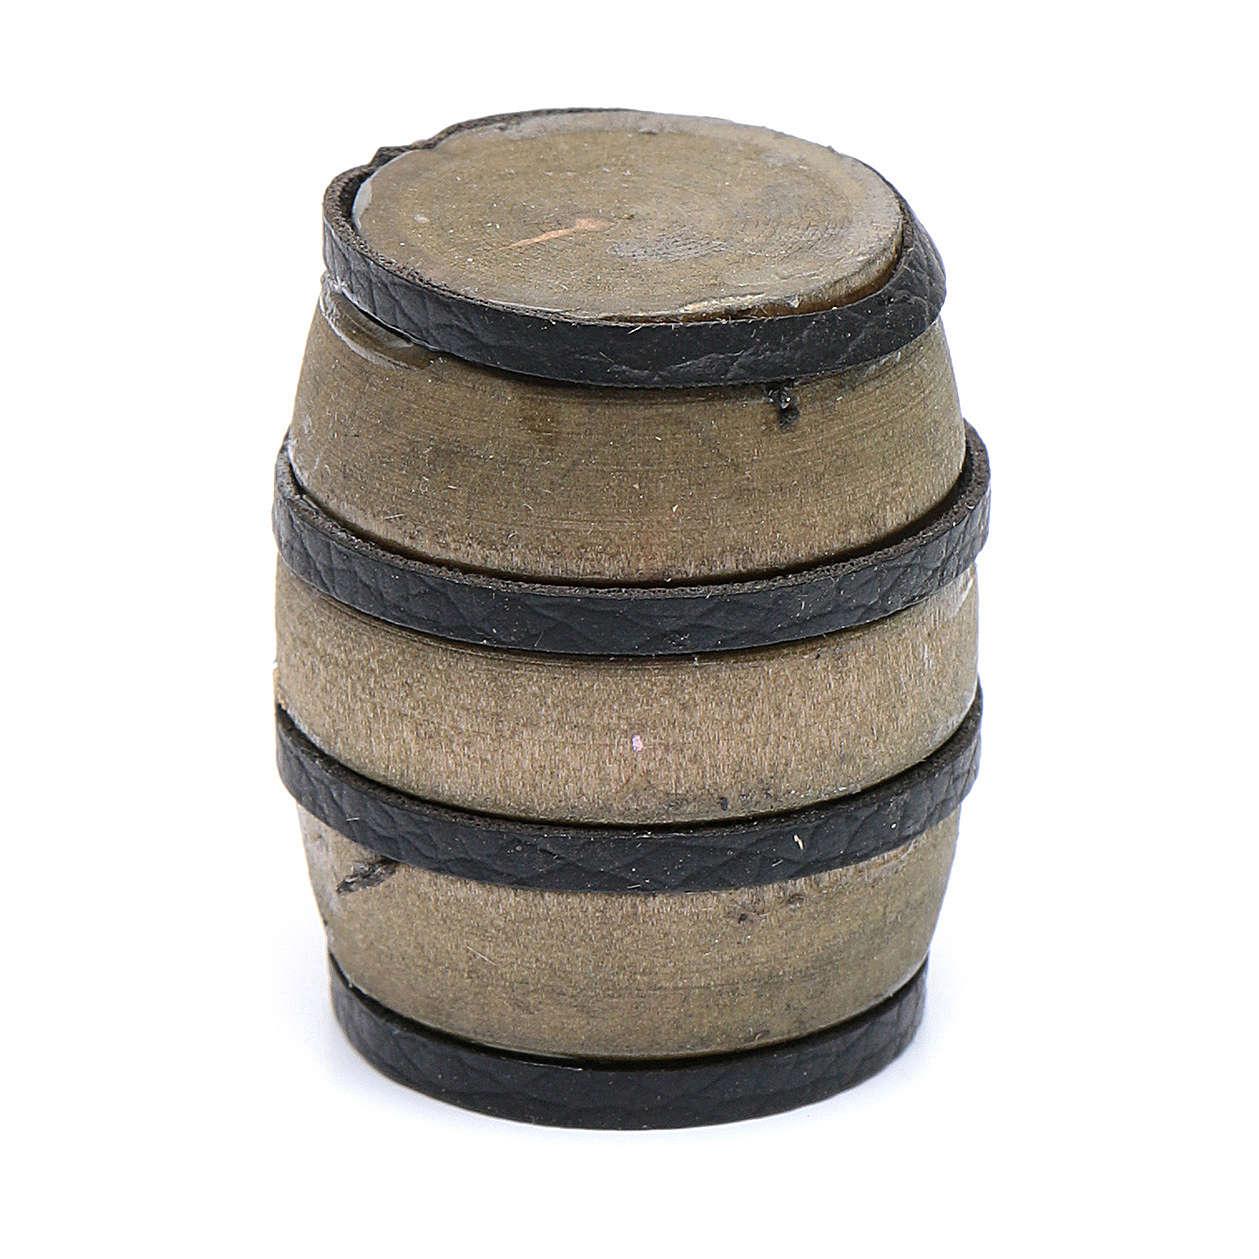 Barril marrón belén 3,6 cm h real 4